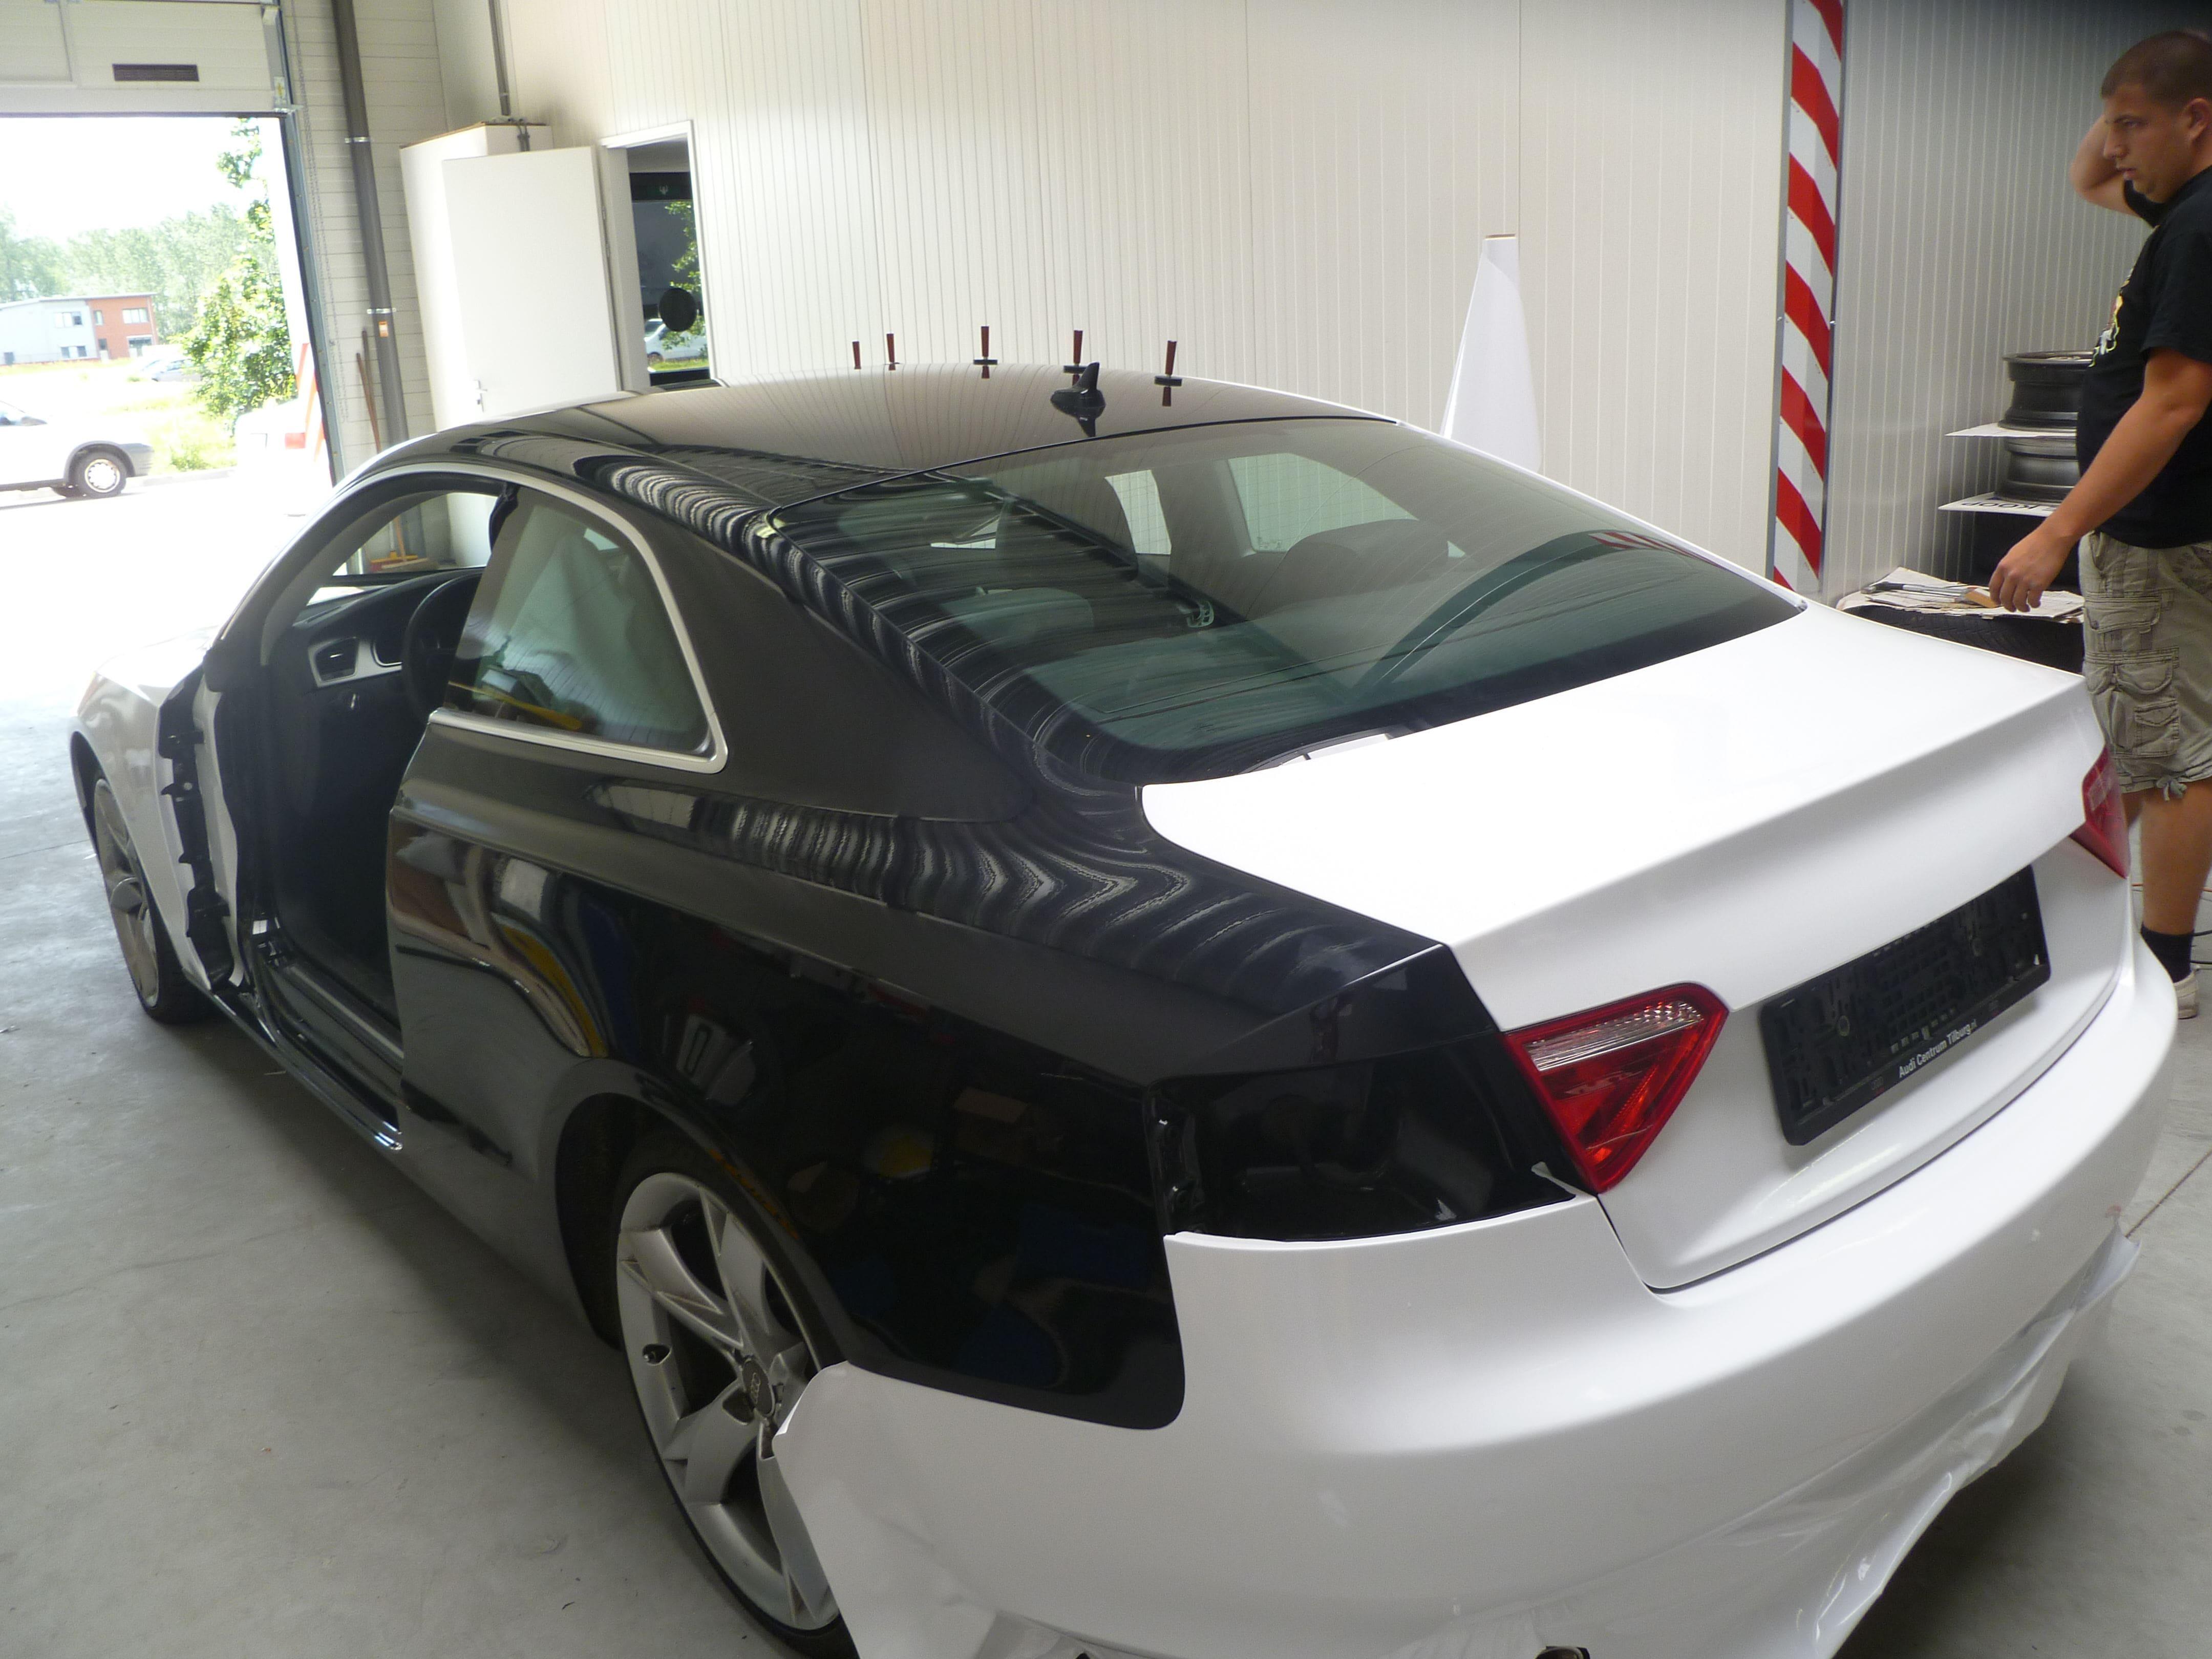 Audi A5 coupe met Metallic Witte Wrap, Carwrapping door Wrapmyride.nu Foto-nr:4723, ©2021